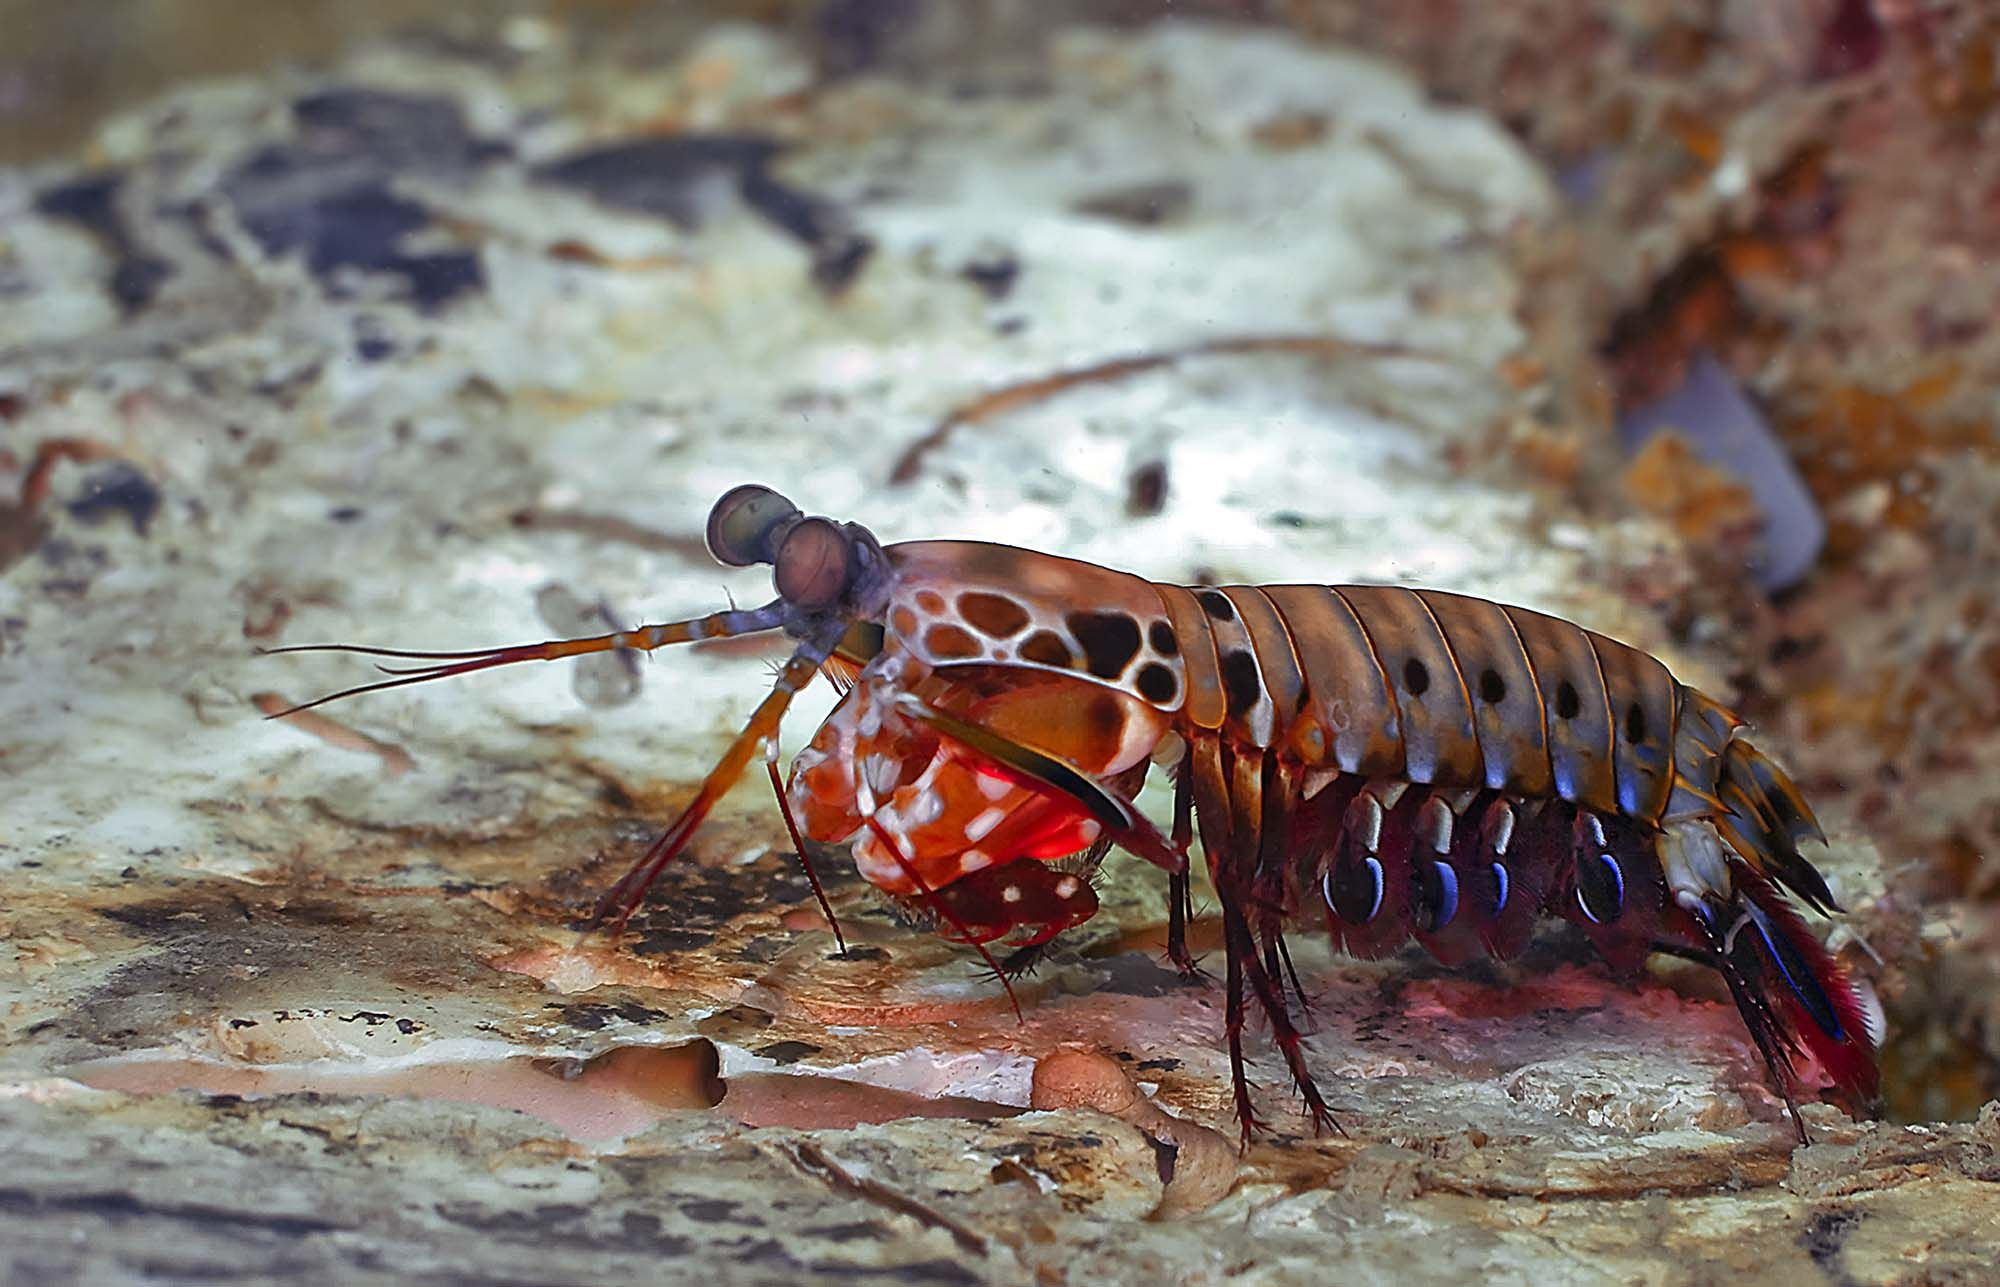 Best Mantis Shrimp photo - HD Wallpapers - Mantis Shrimp | Animal ...